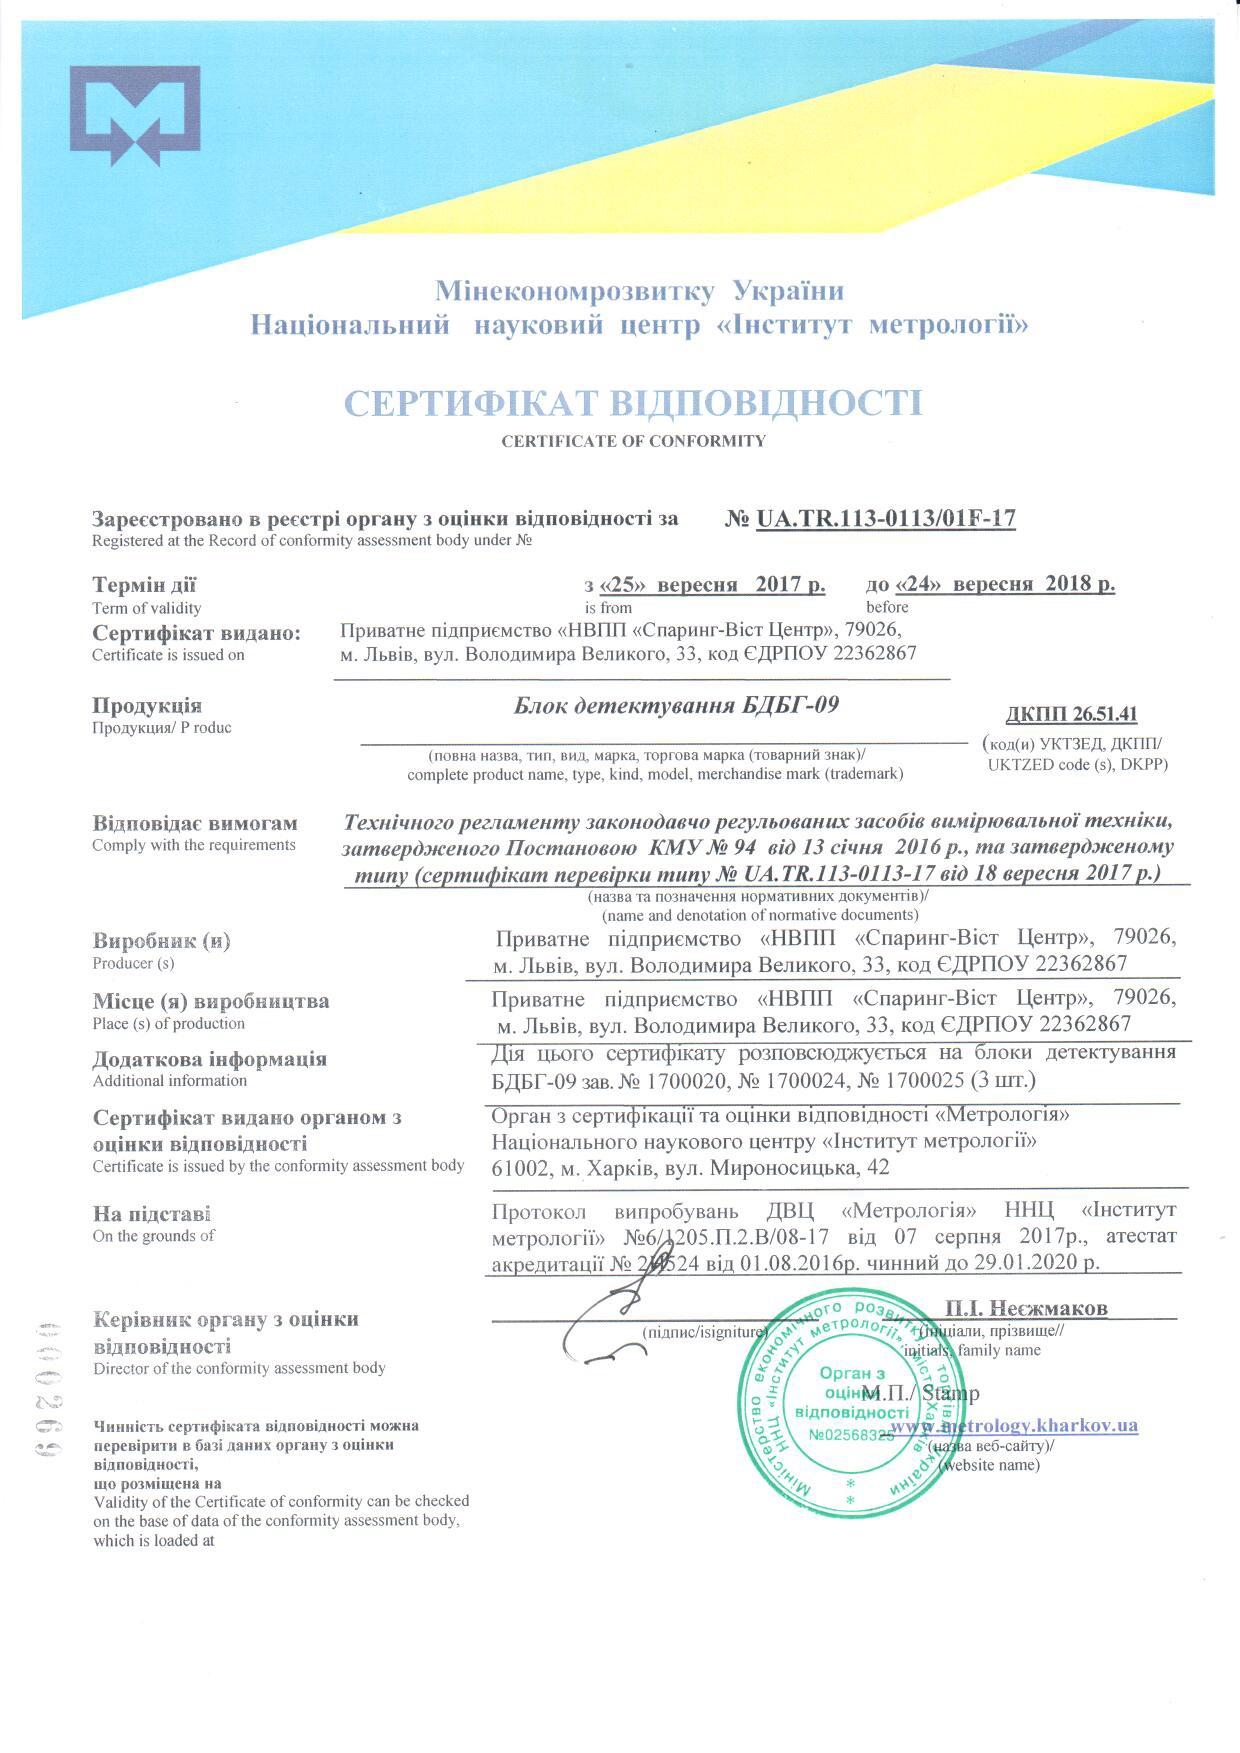 Radioactive certificate non 49 CFR